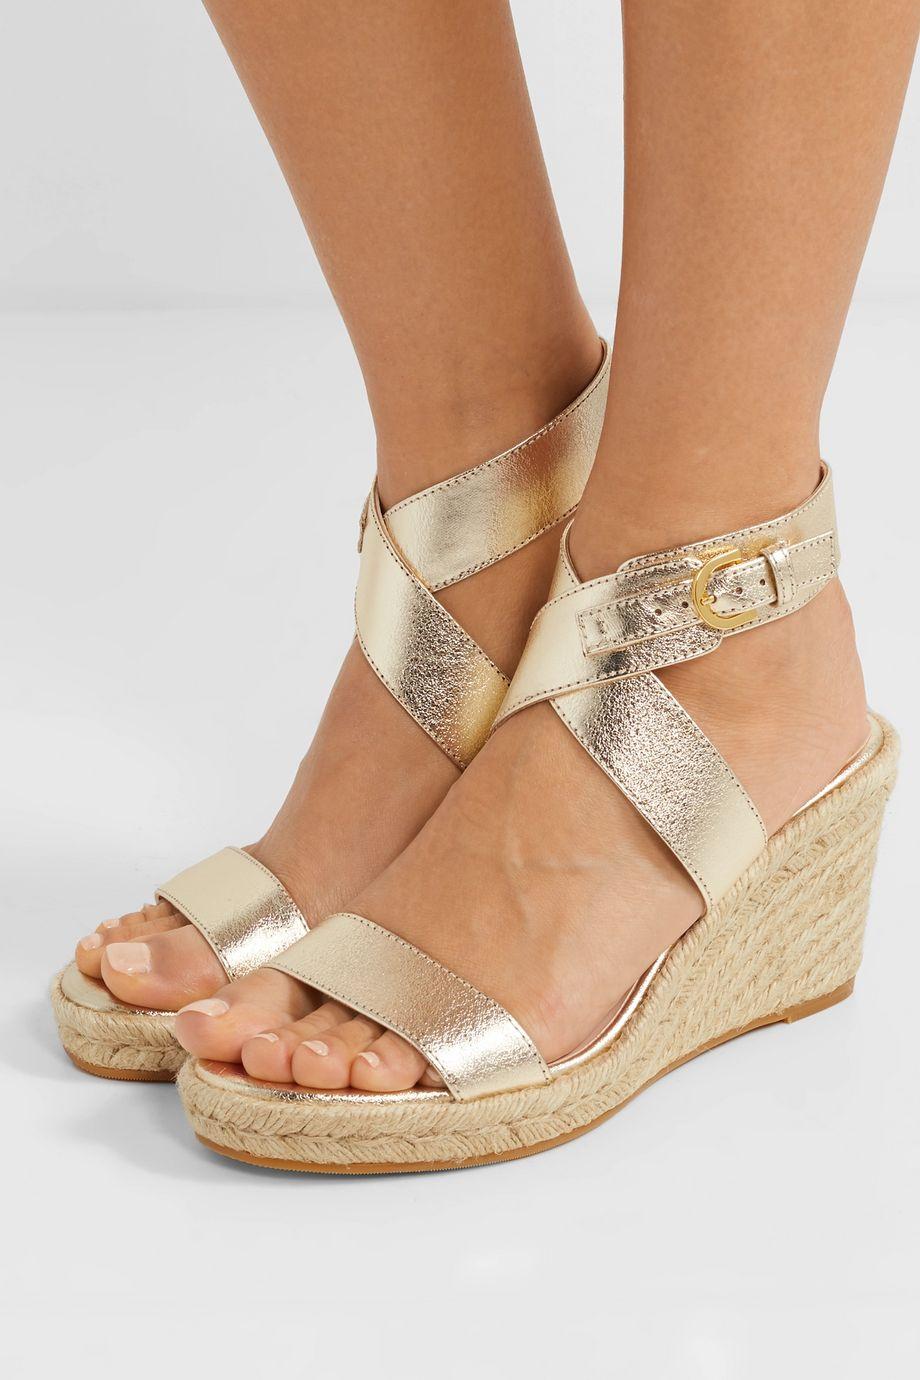 Stuart Weitzman Lexia metallic textured-leather espadrille wedge sandals